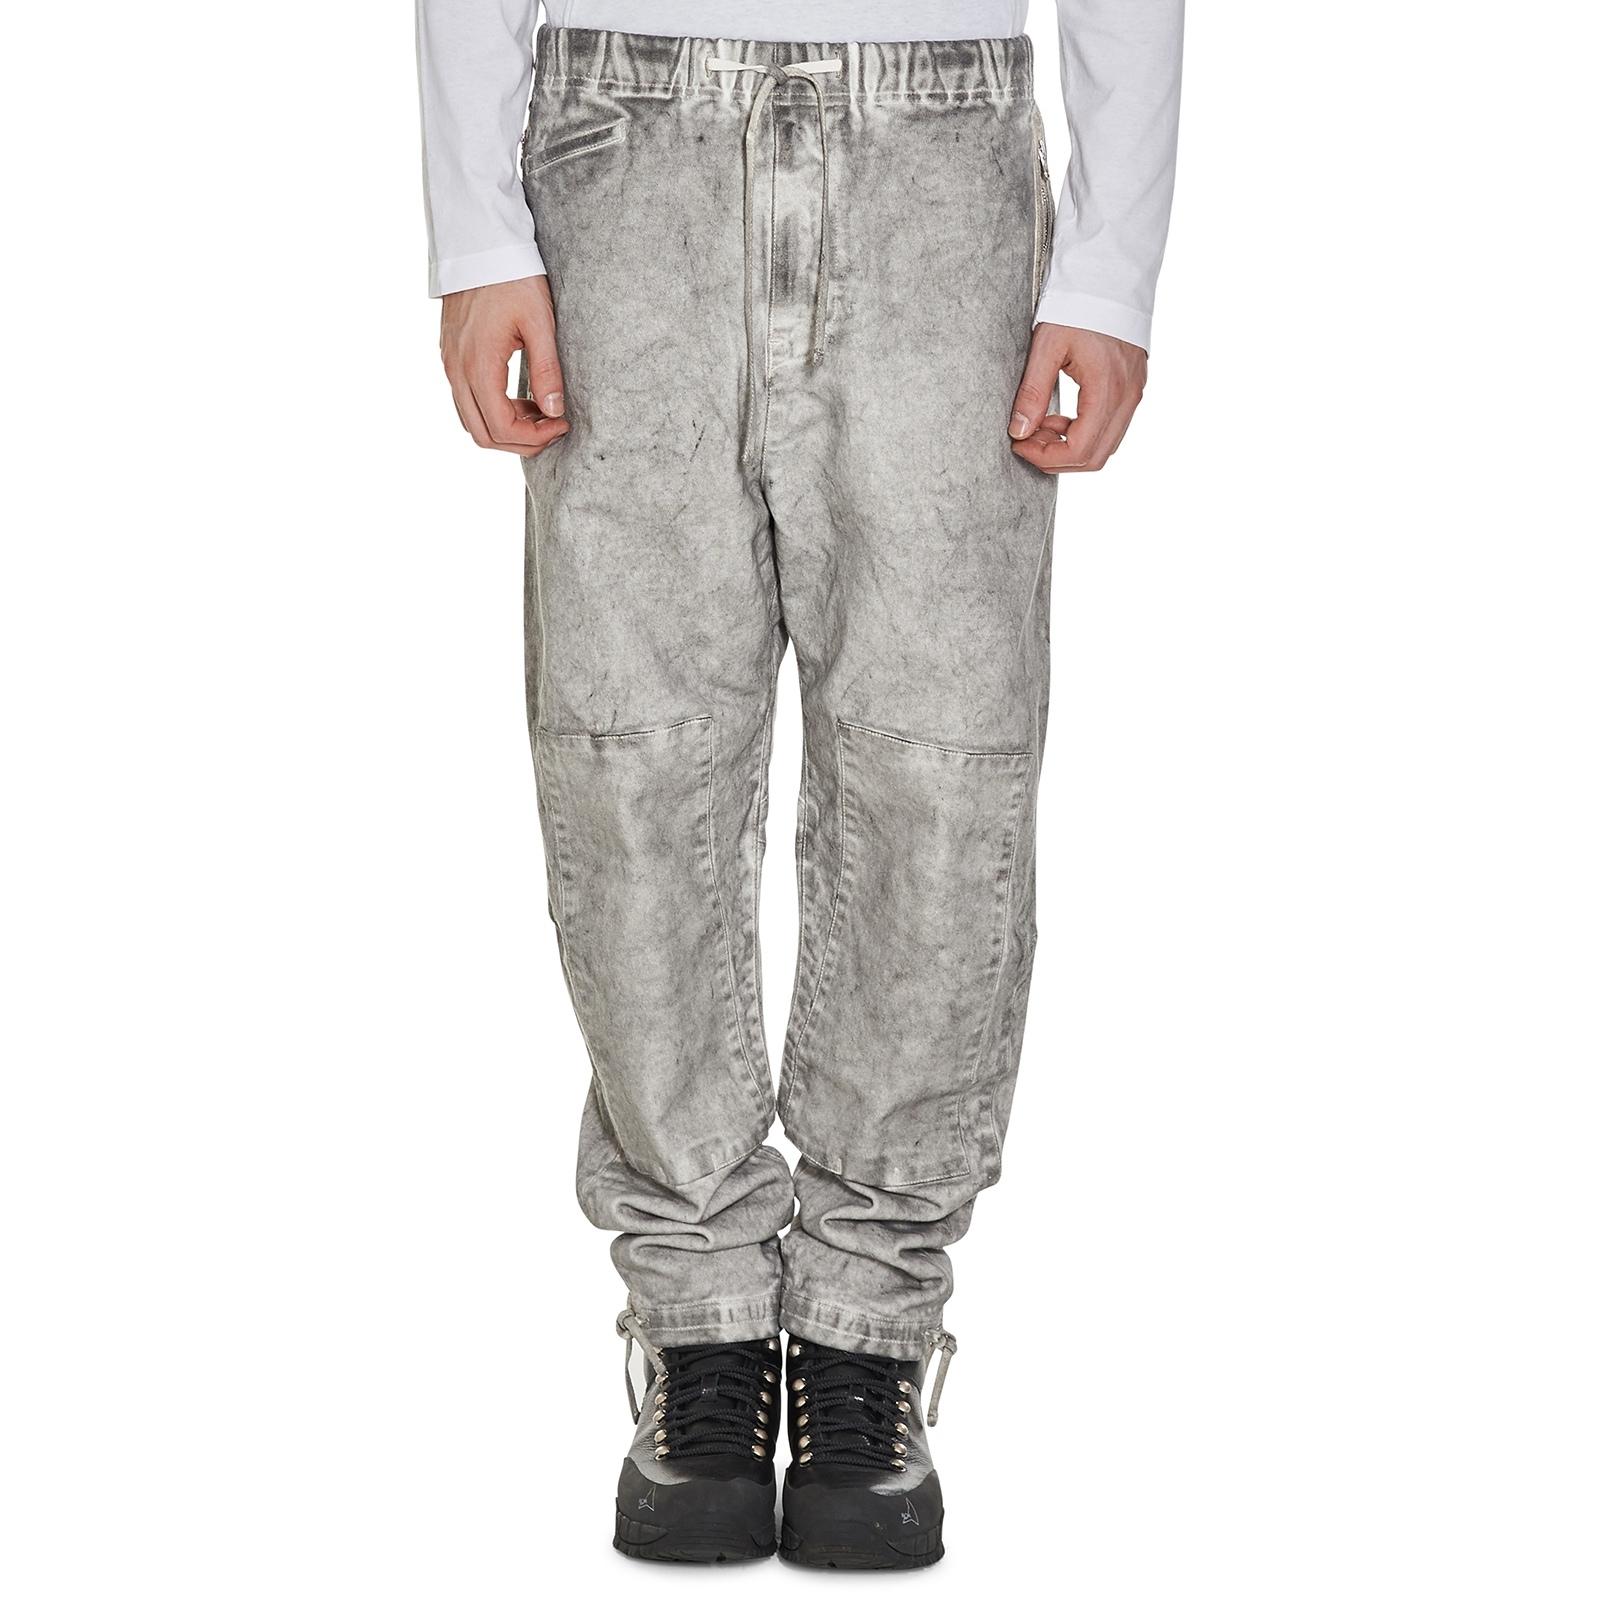 ed45ea103d Very Goods | Stone Island Shadow Project NBC Pants Pants - Slam Jam  Socialism